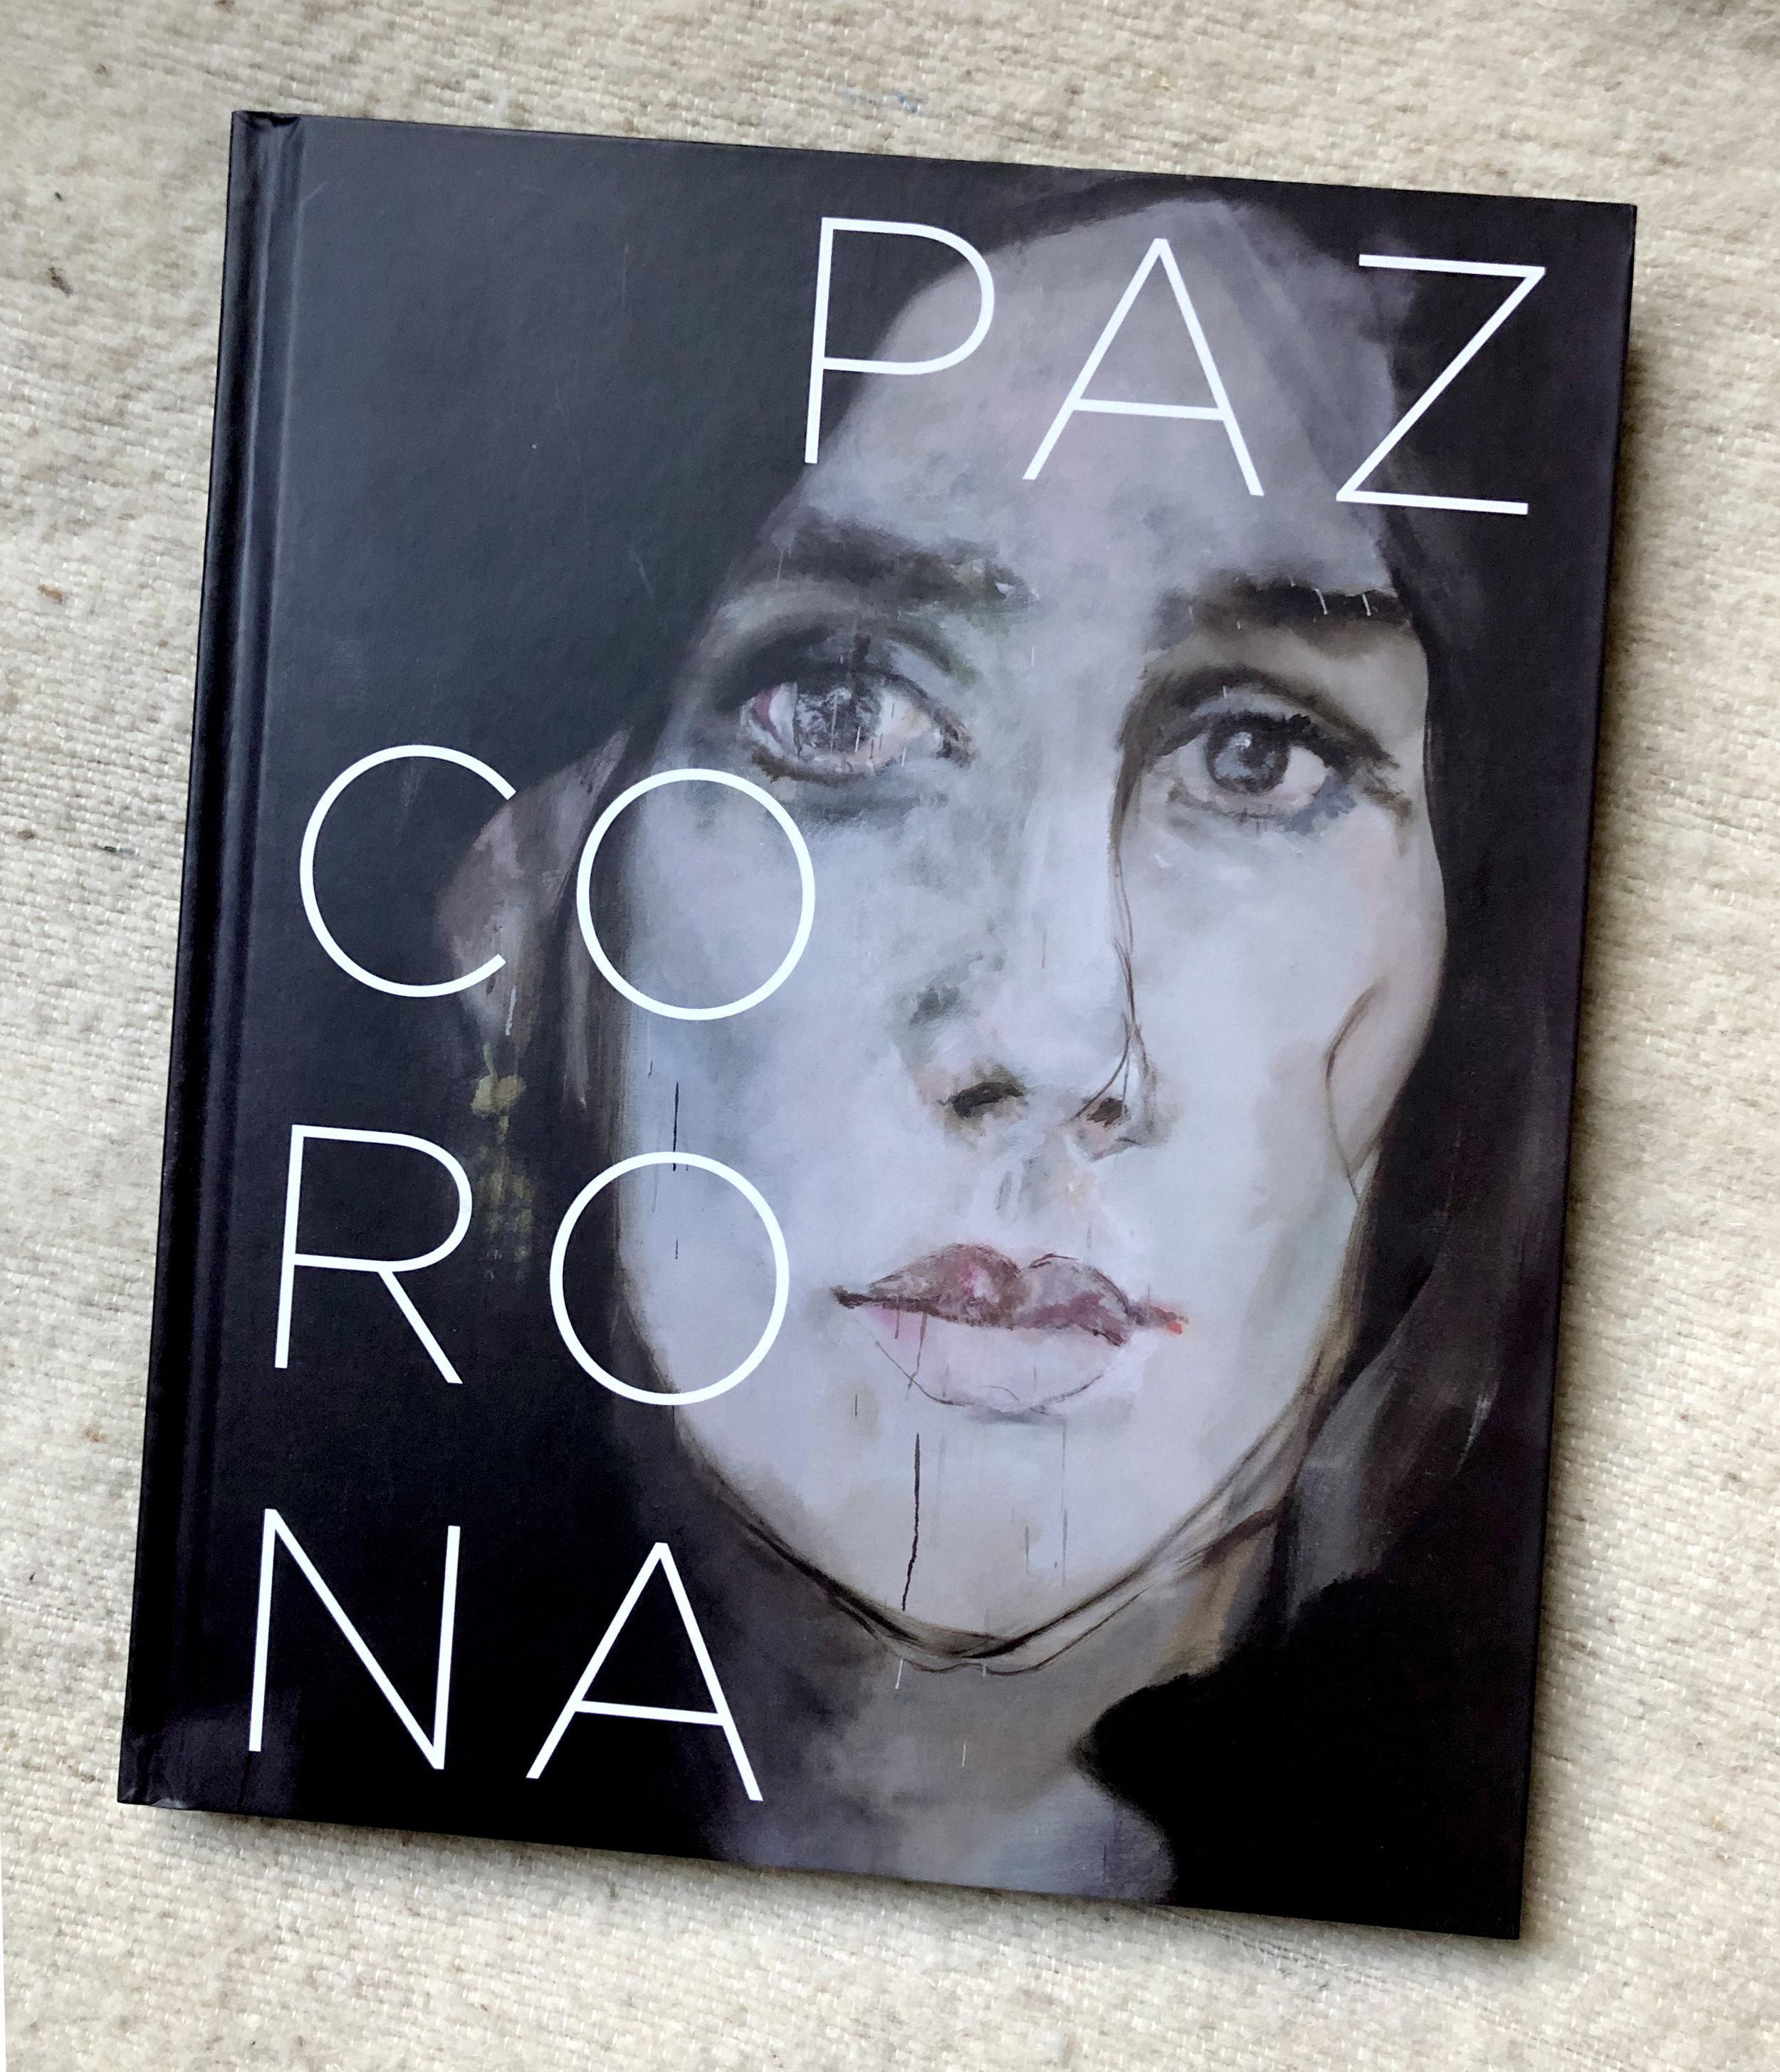 Paz_Corona_Editionsduregard.jpg